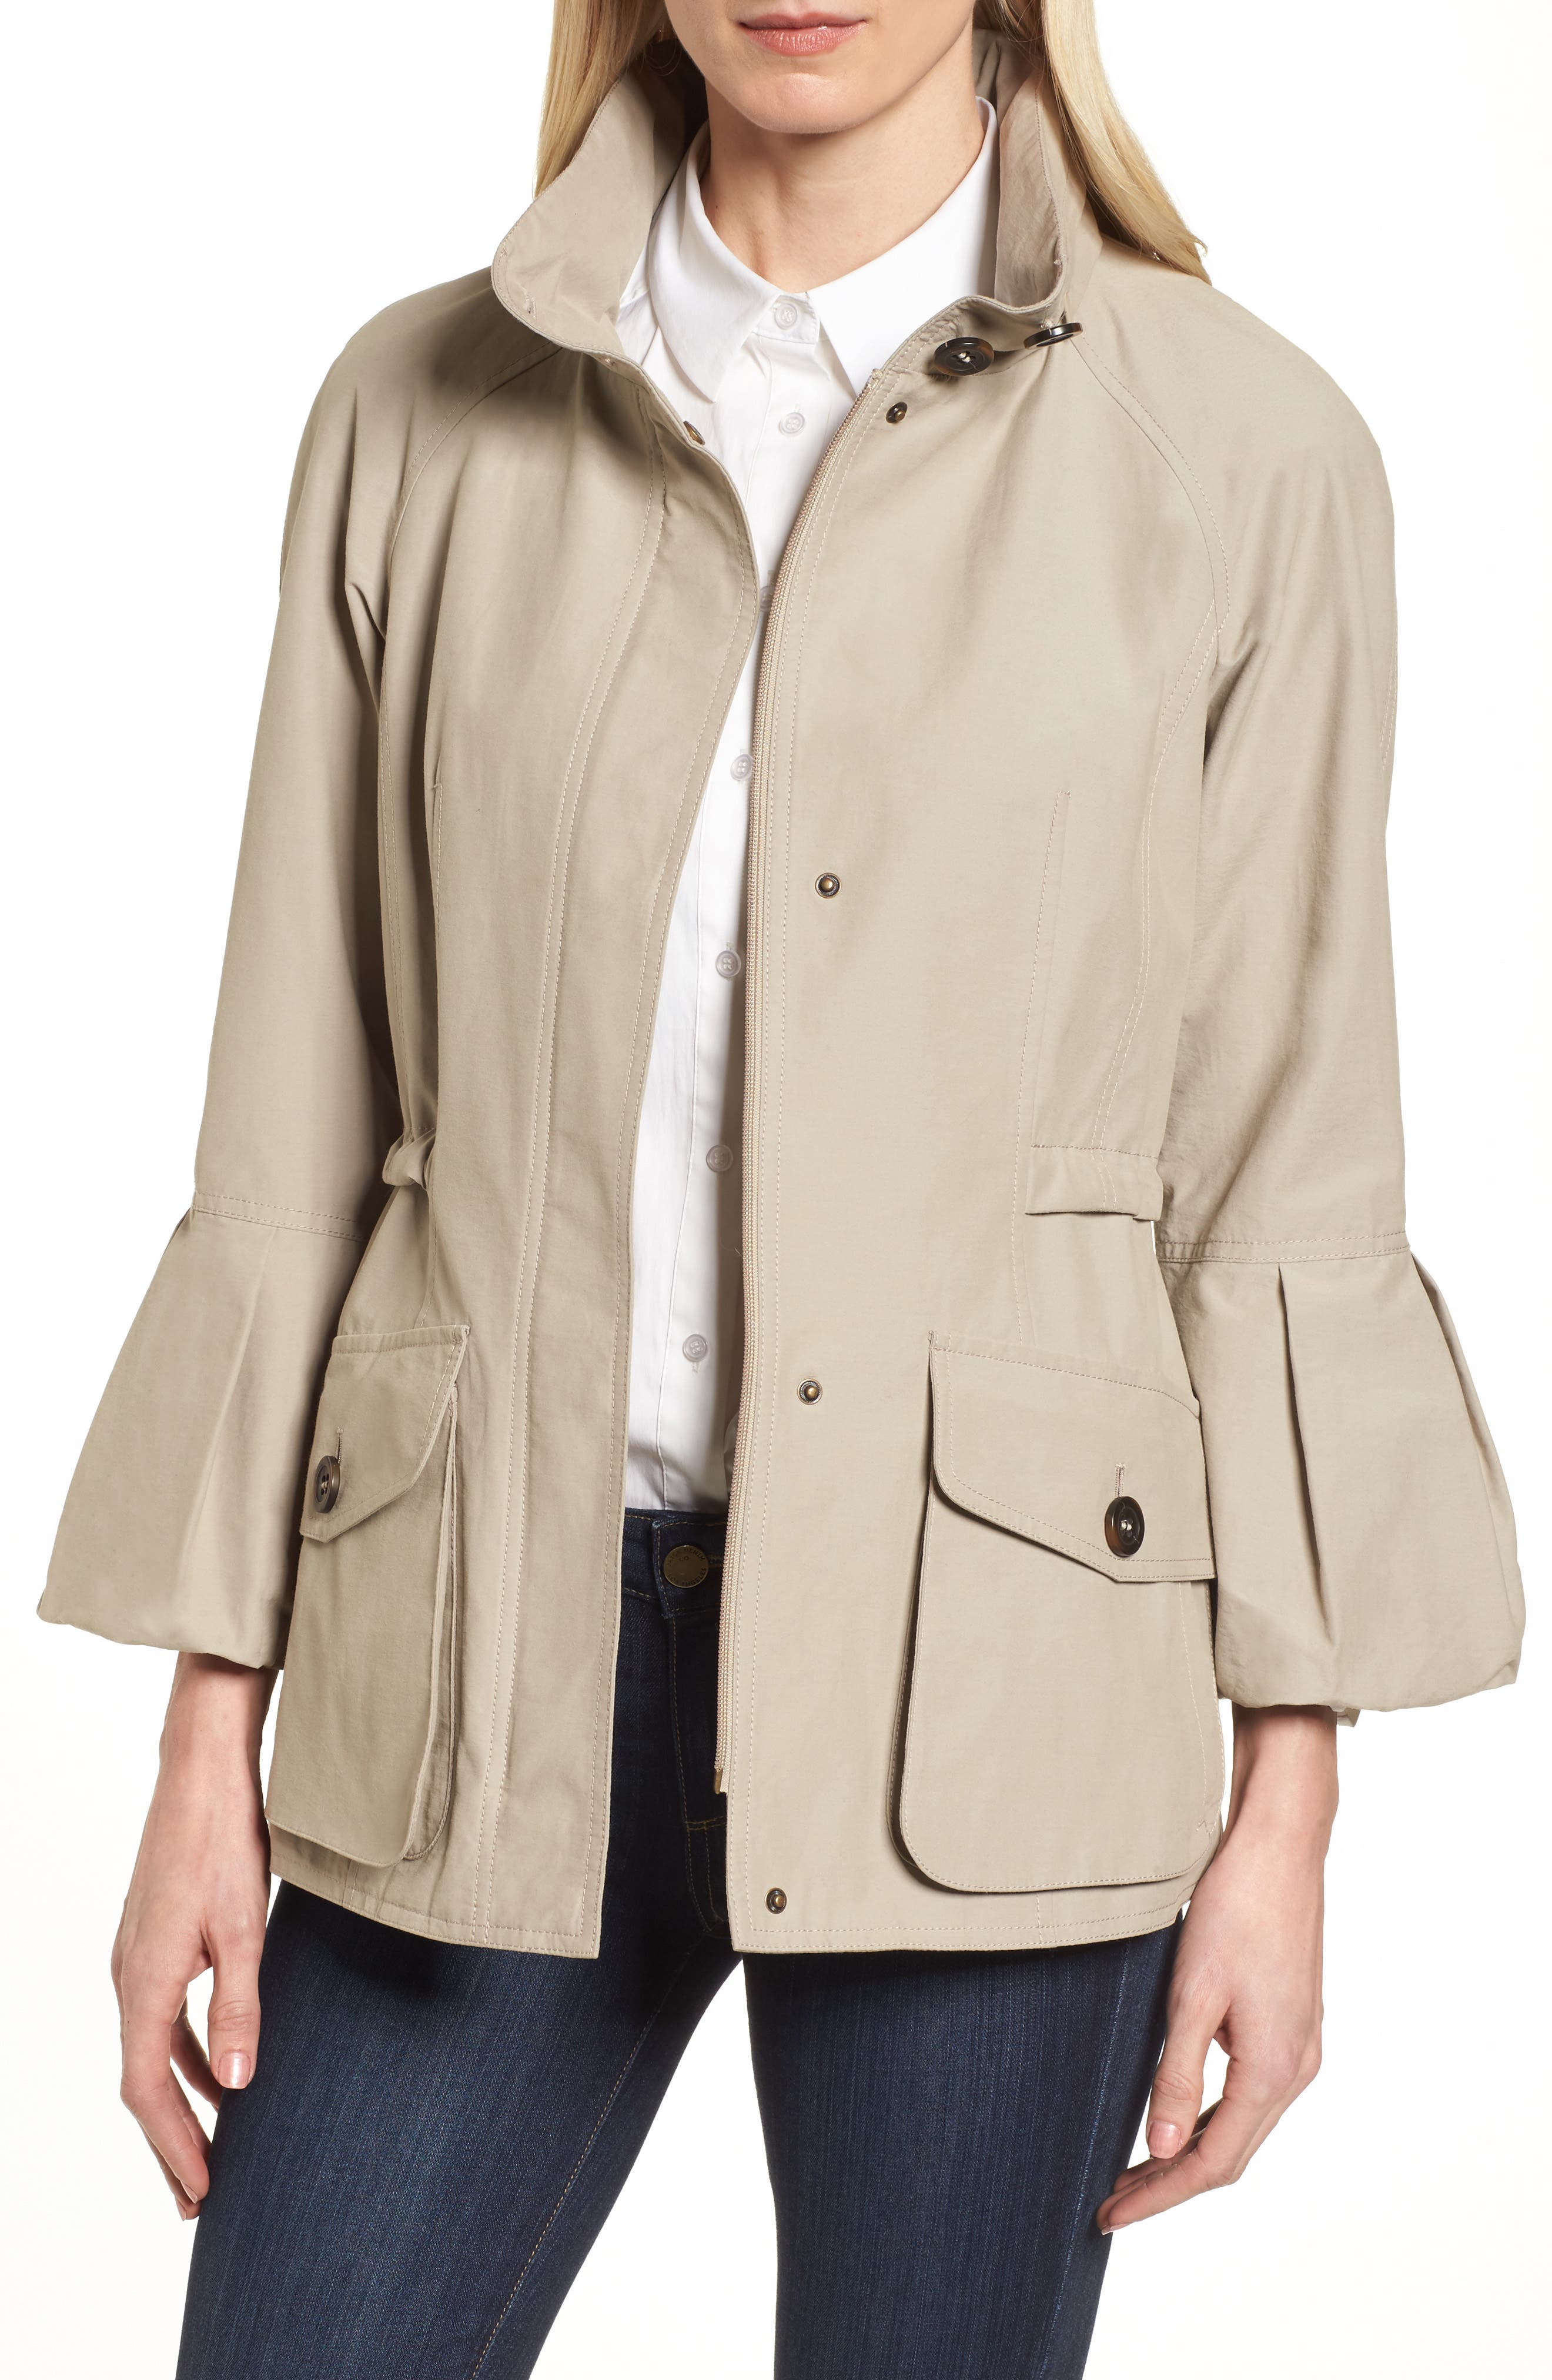 Bell Sleeve Jacket with Stowaway Hood,                             Main thumbnail 1, color,                             255